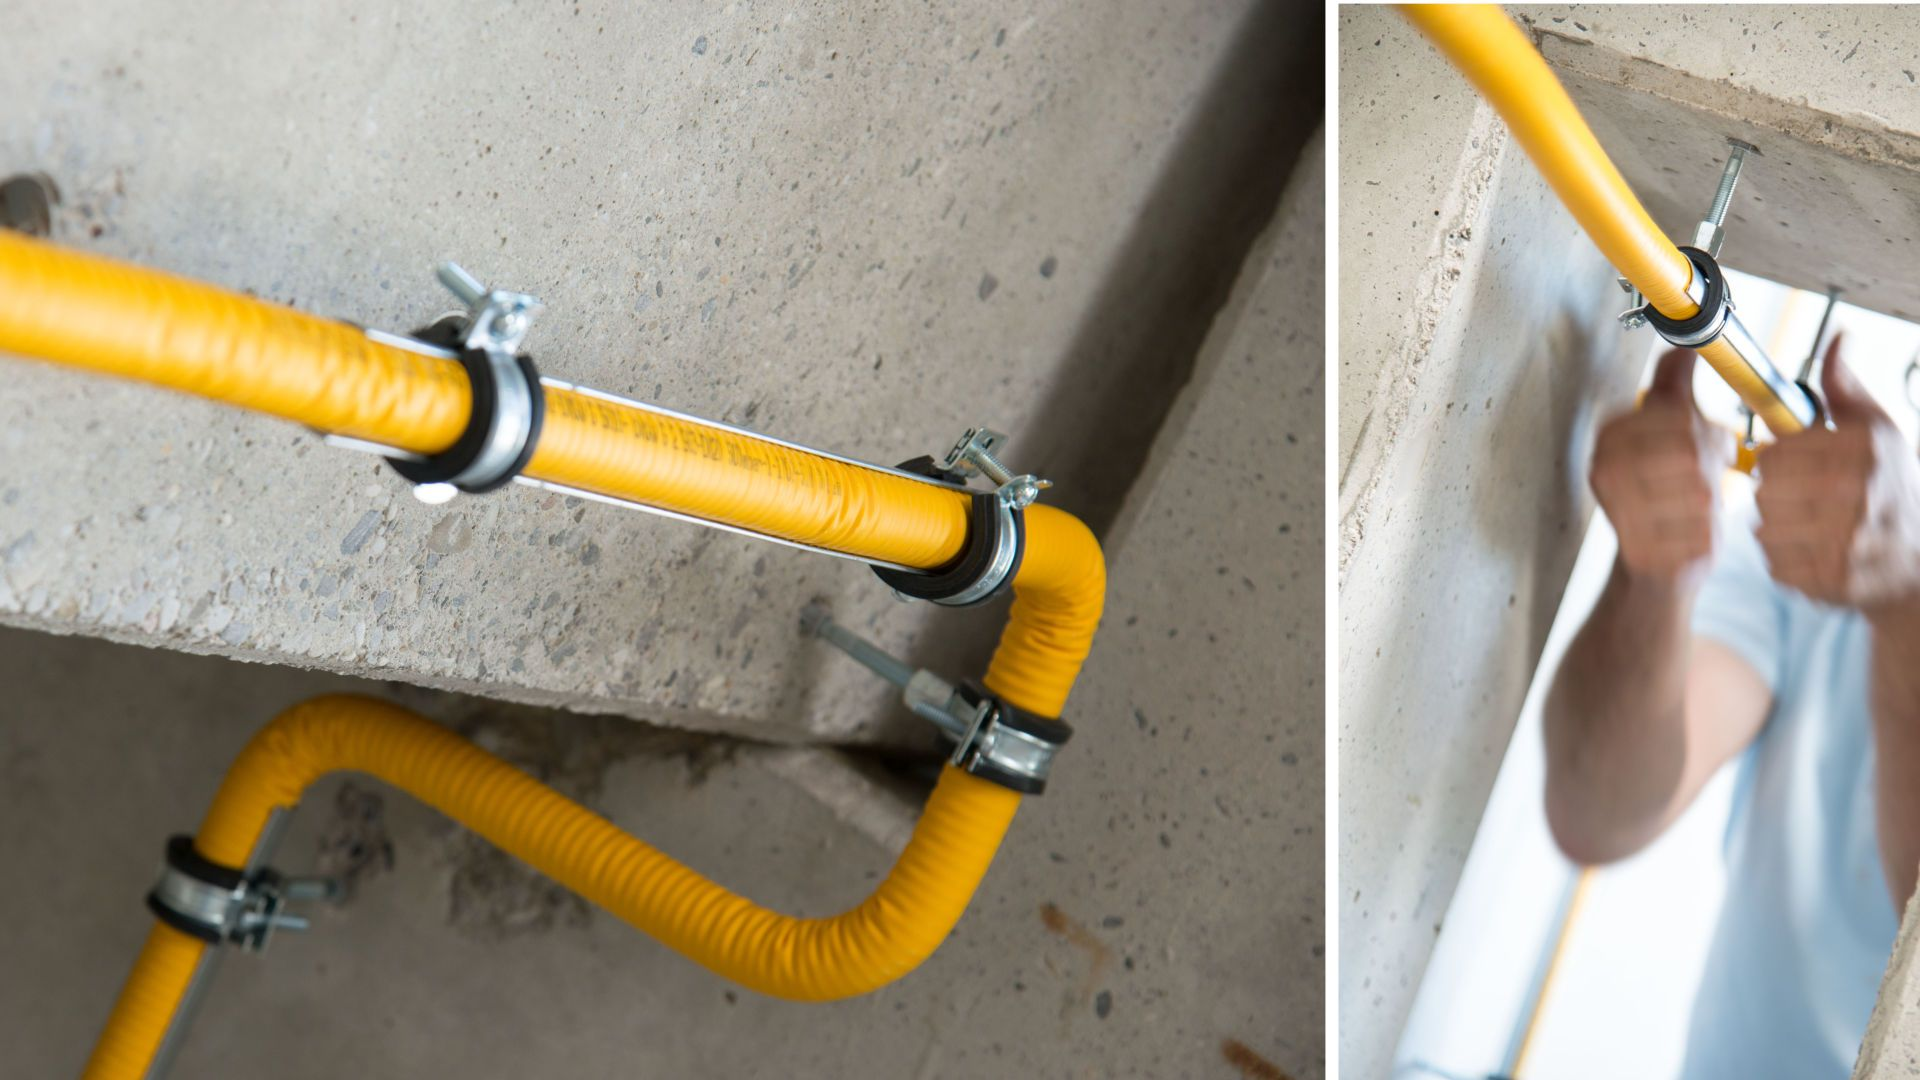 Bevorzugt Flexible Gasleitungen aus Edelstallwellrohren | BOAGAZ - heinze.de XO09